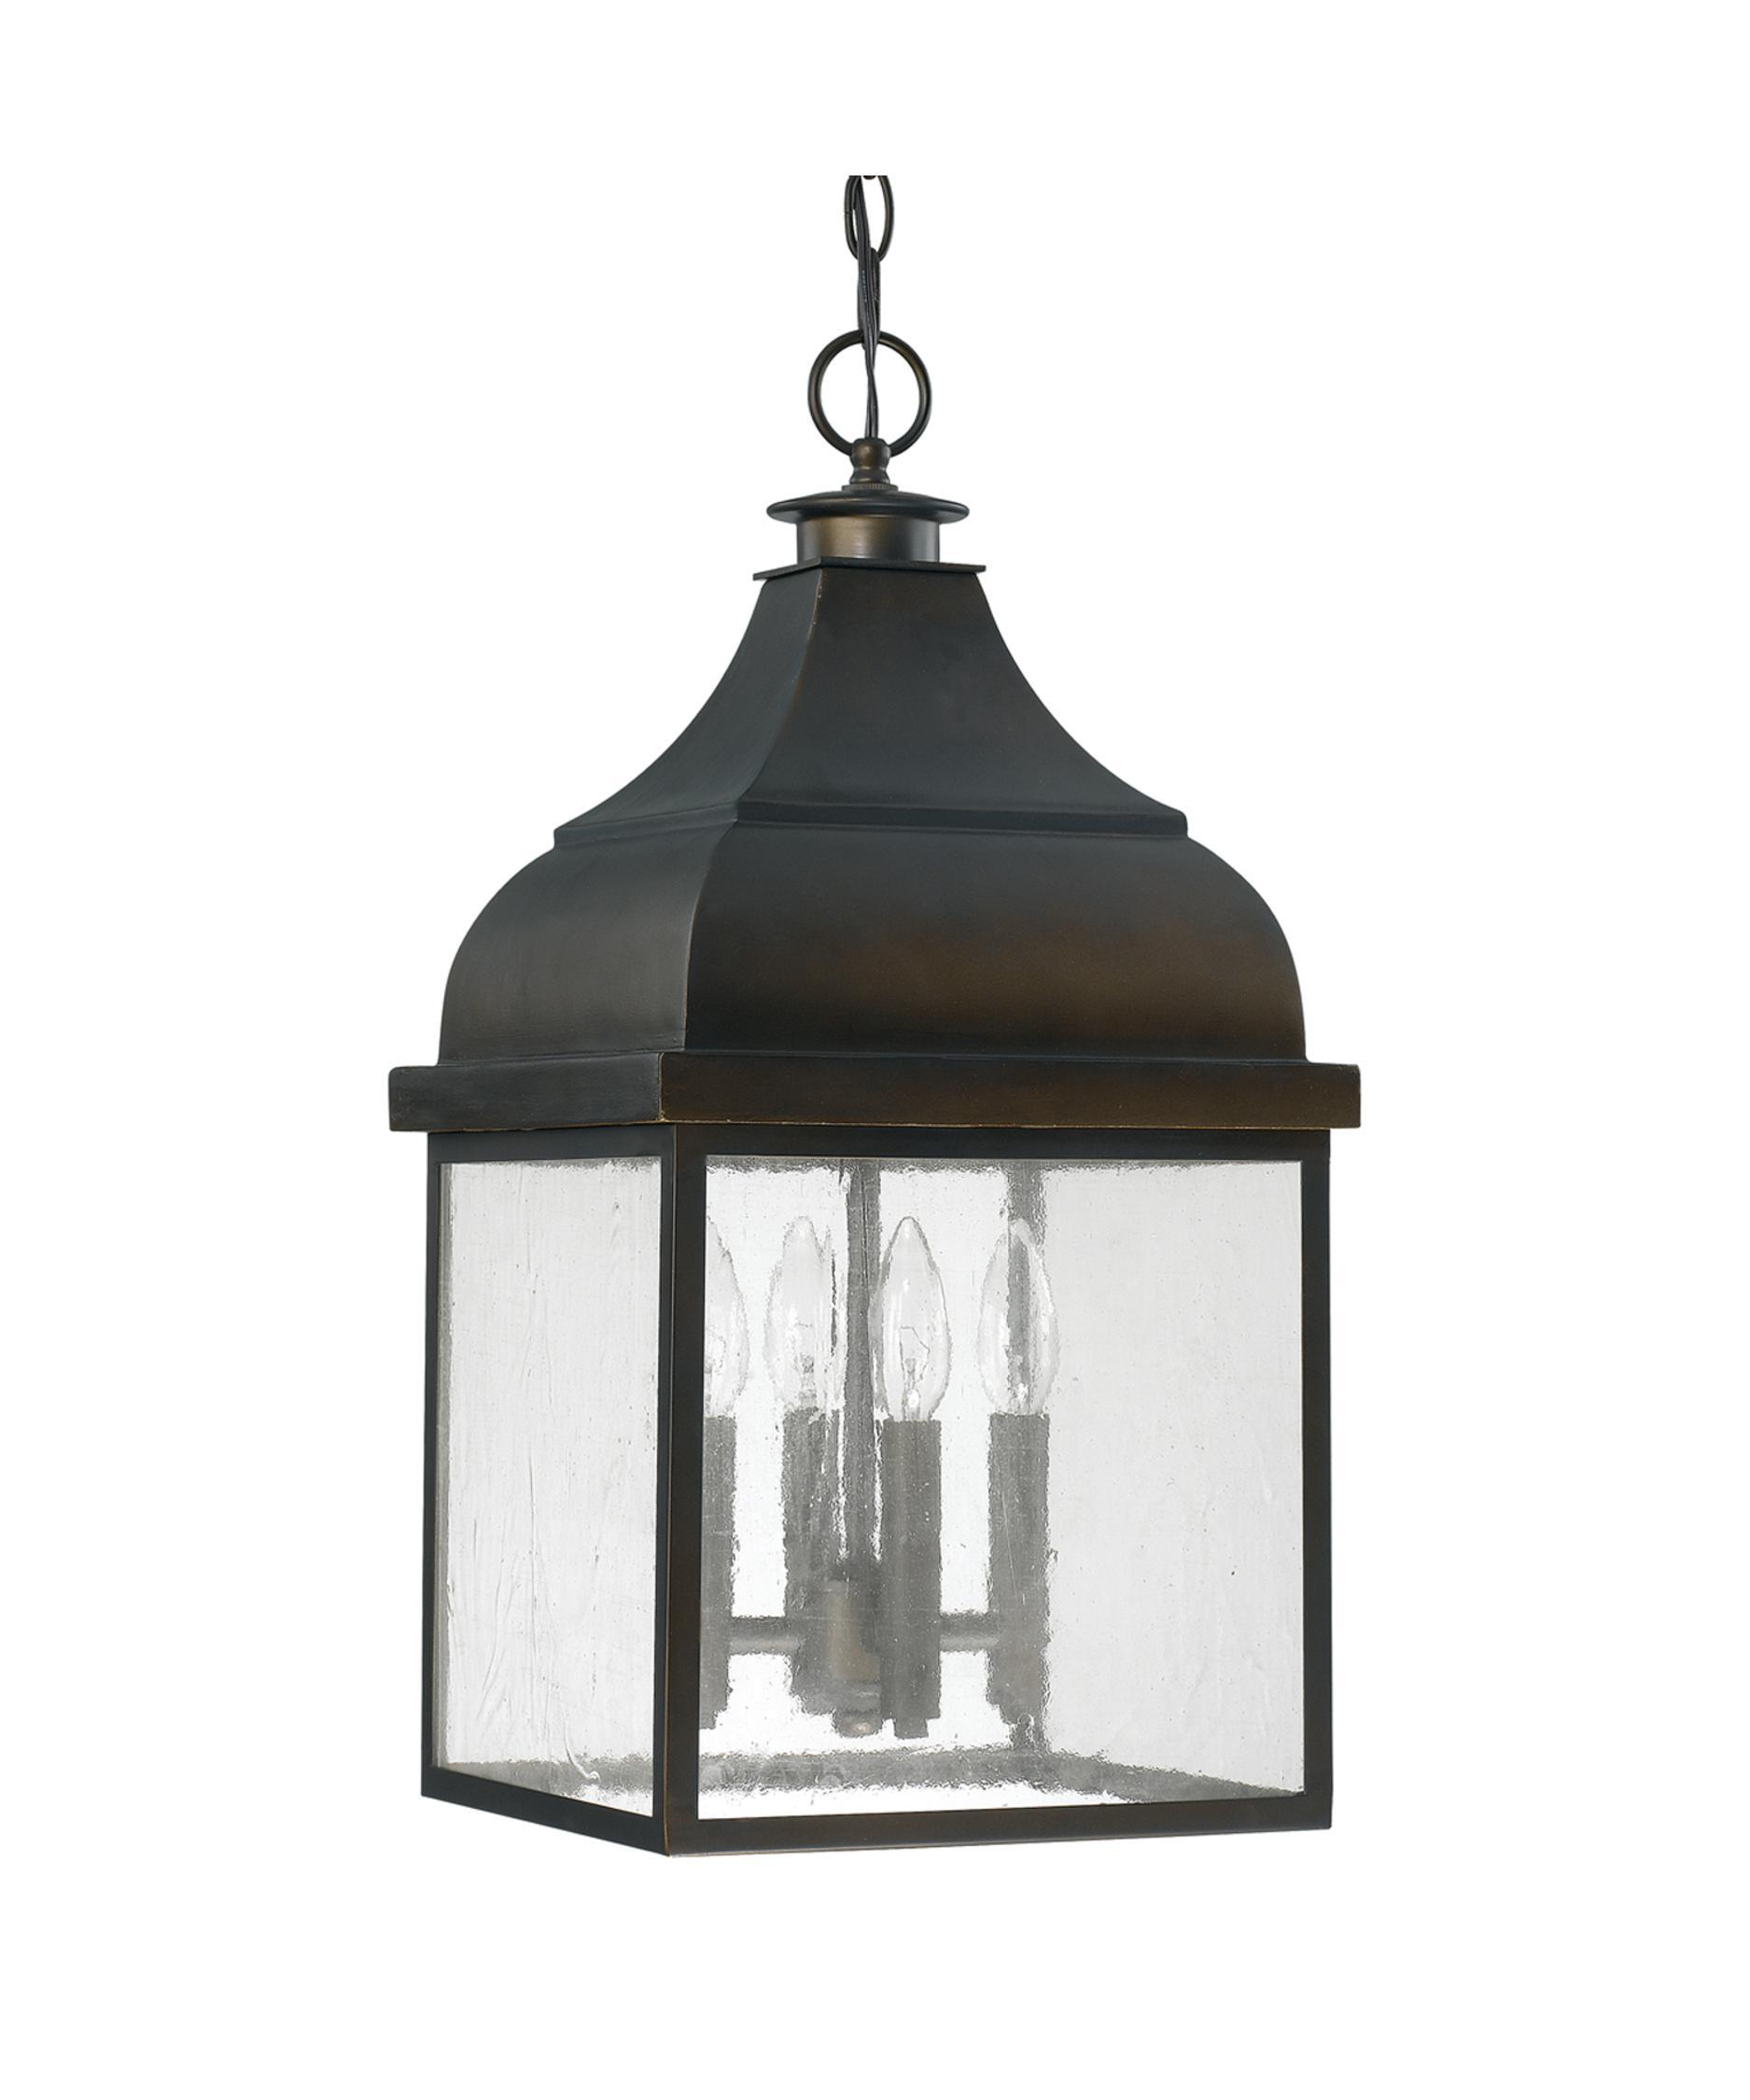 capital lighting westridge 11 inch wide 4 light outdoor hanging lantern capitol lighting - Capital Lighting